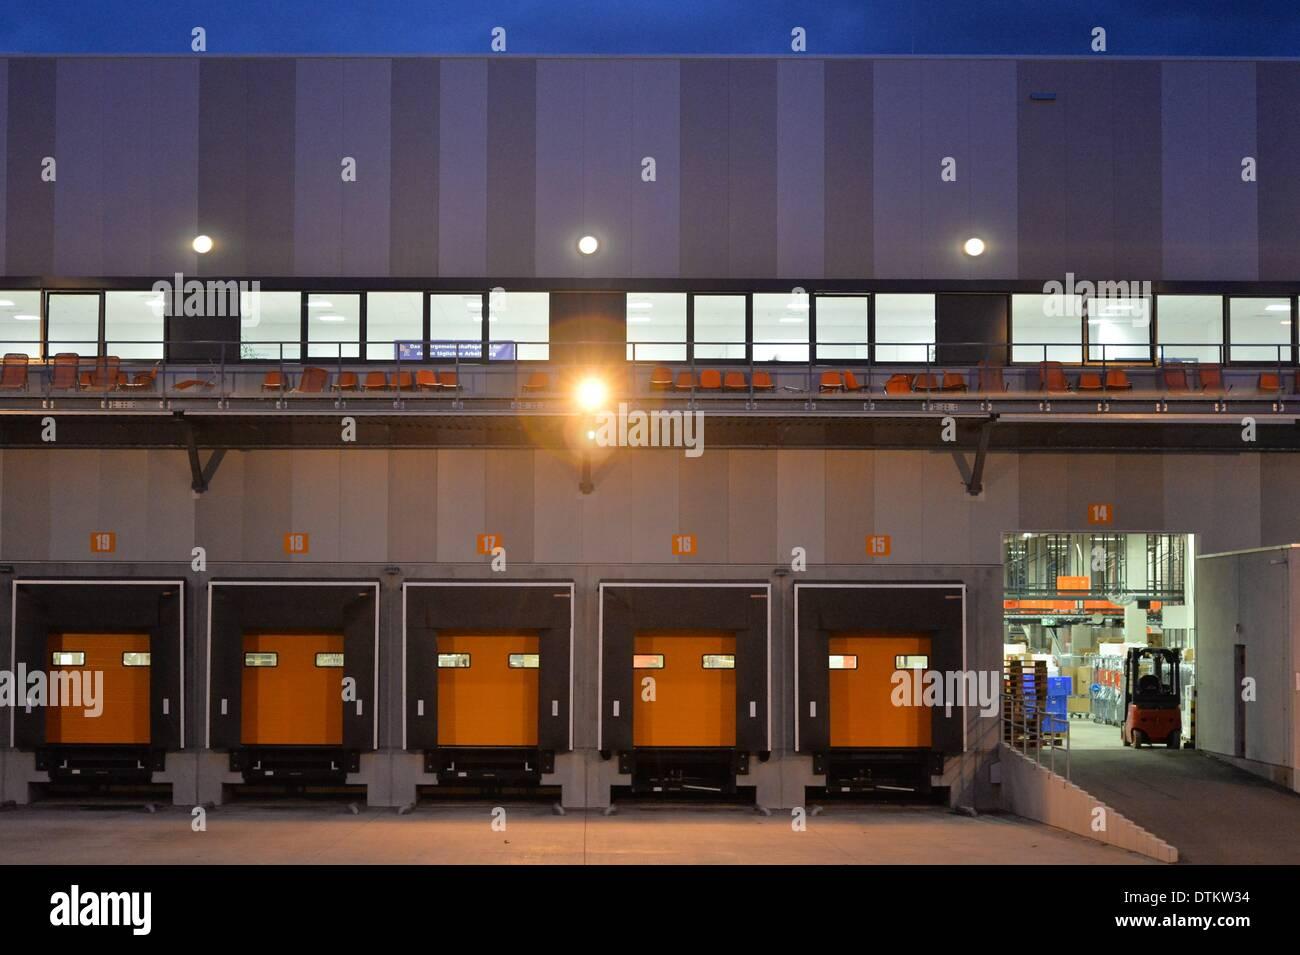 586951bad59 The logistics center of online retailer Zalando in Erfurt, Germany, 23  October 2013. Photo: Marc Tirl/dpa/Alamy Live News